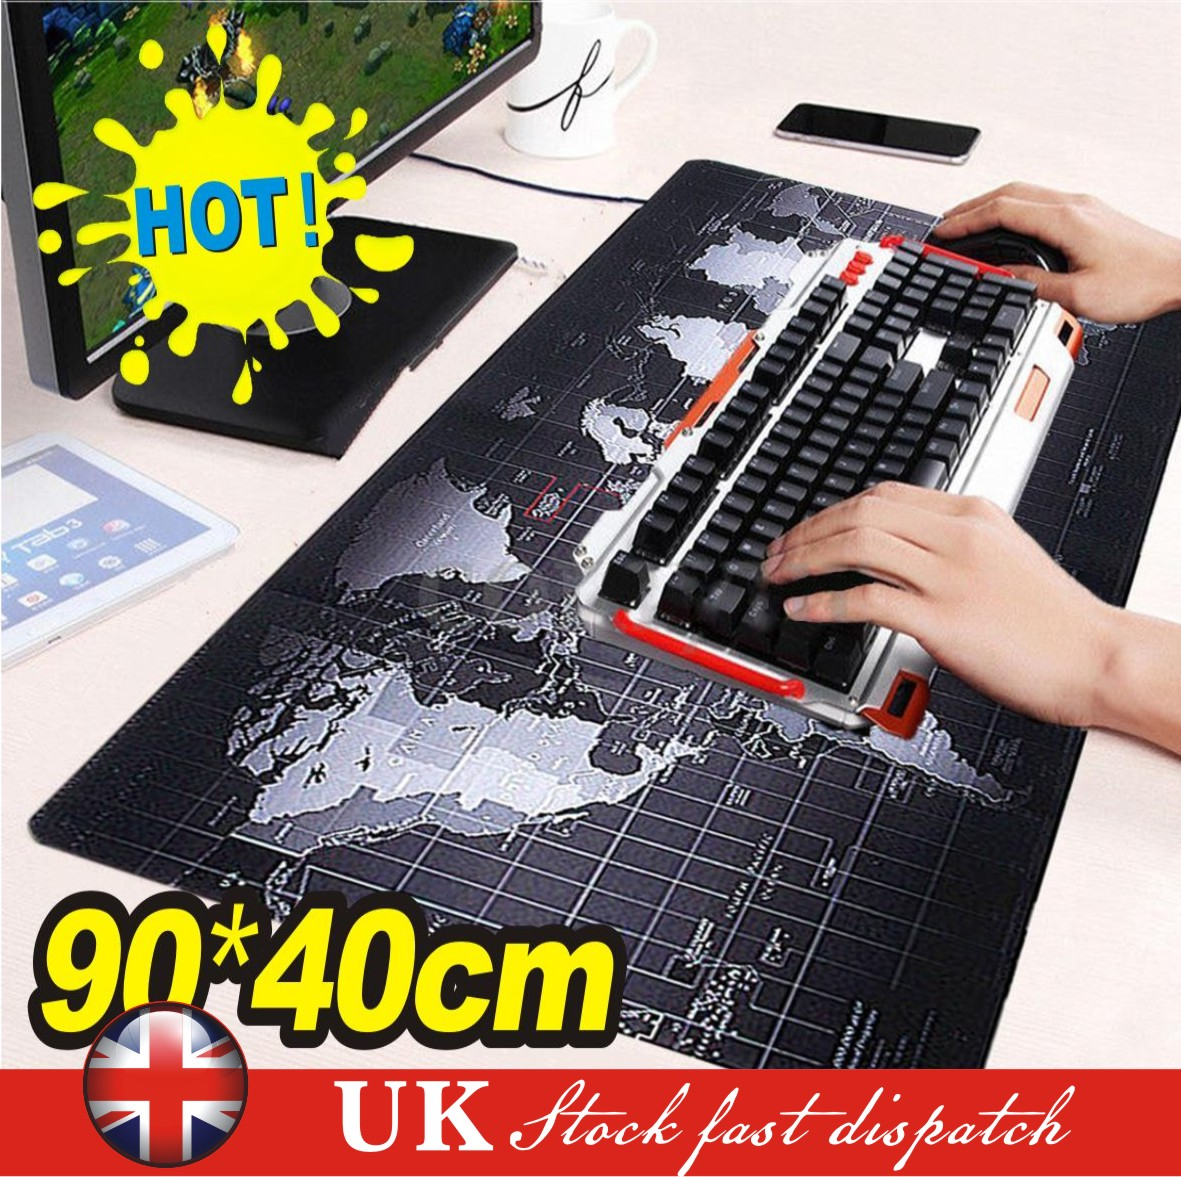 Anti Slip Extra Large Size Gaming Mouse Pad Desk Keyboard Mat for PC Laptop MAC